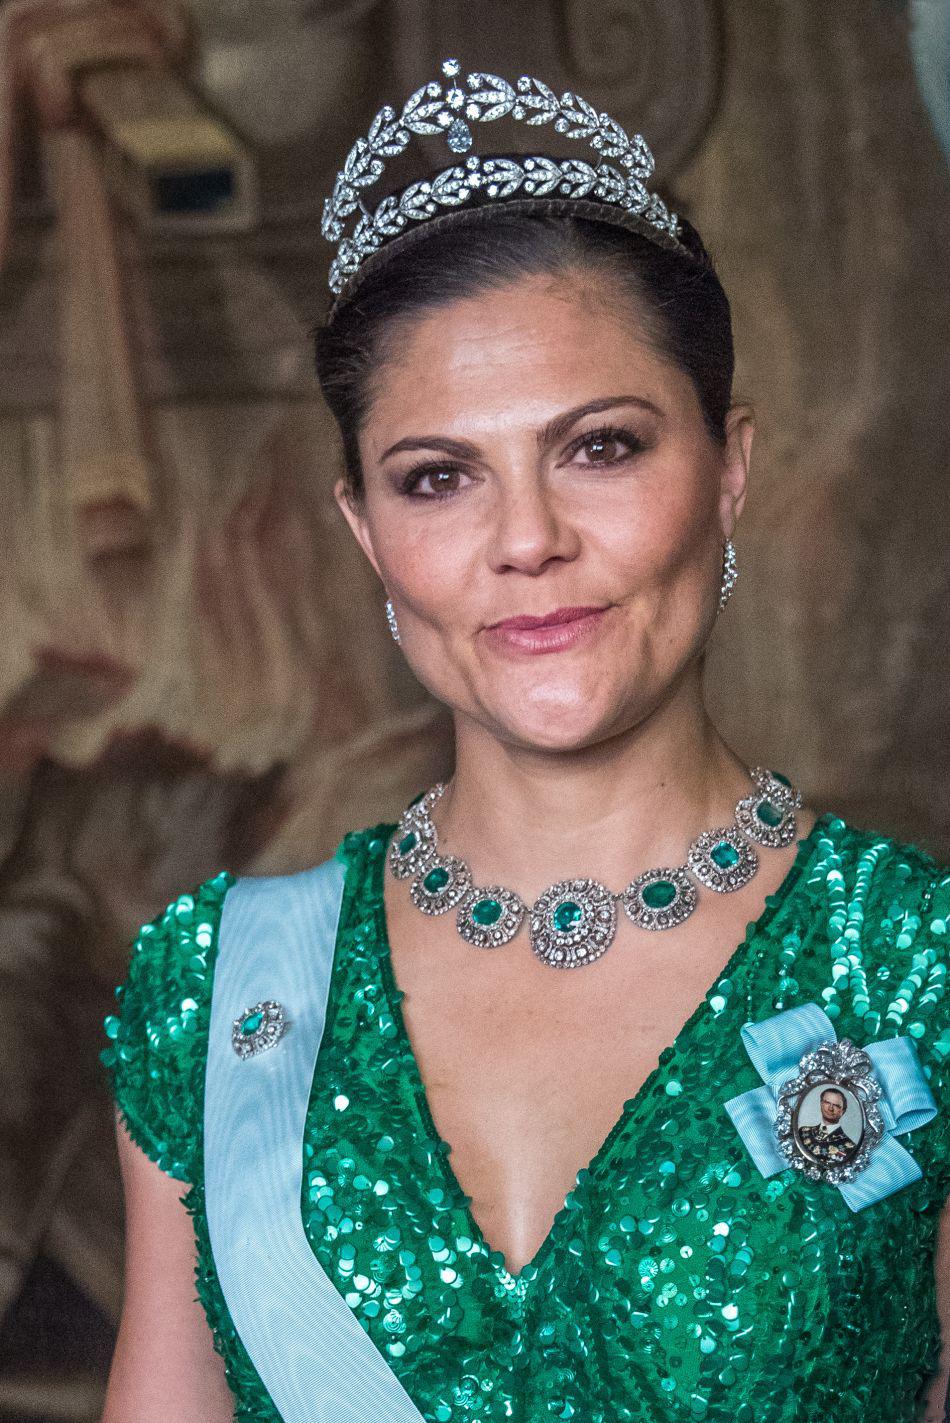 Swedish Crown Braid Tutorial: Royal Family Around The World: The Swedish Royal Family